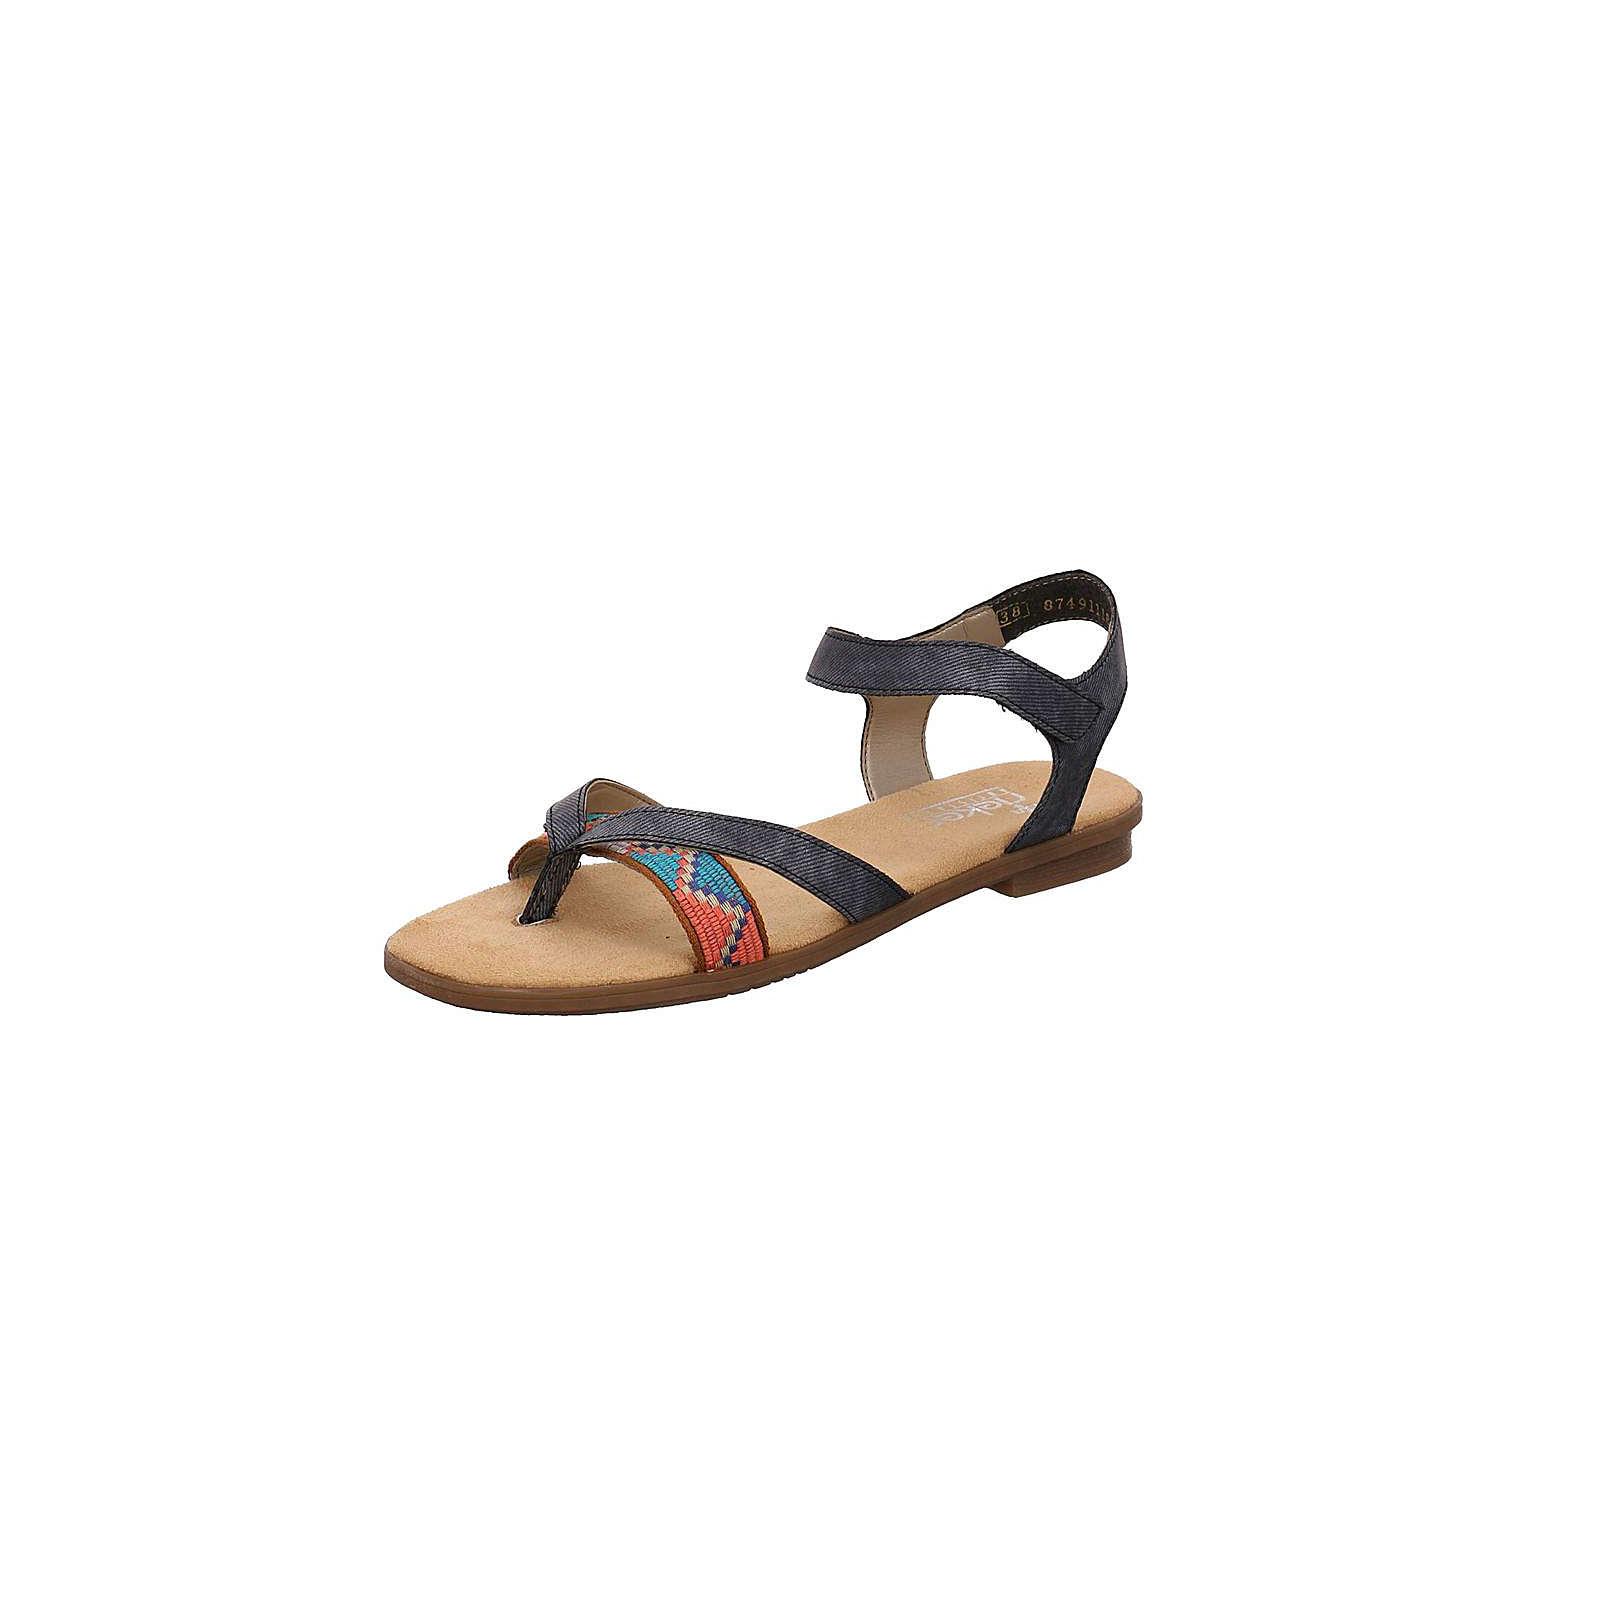 rieker Klassische Sandalen blau Damen Gr. 41